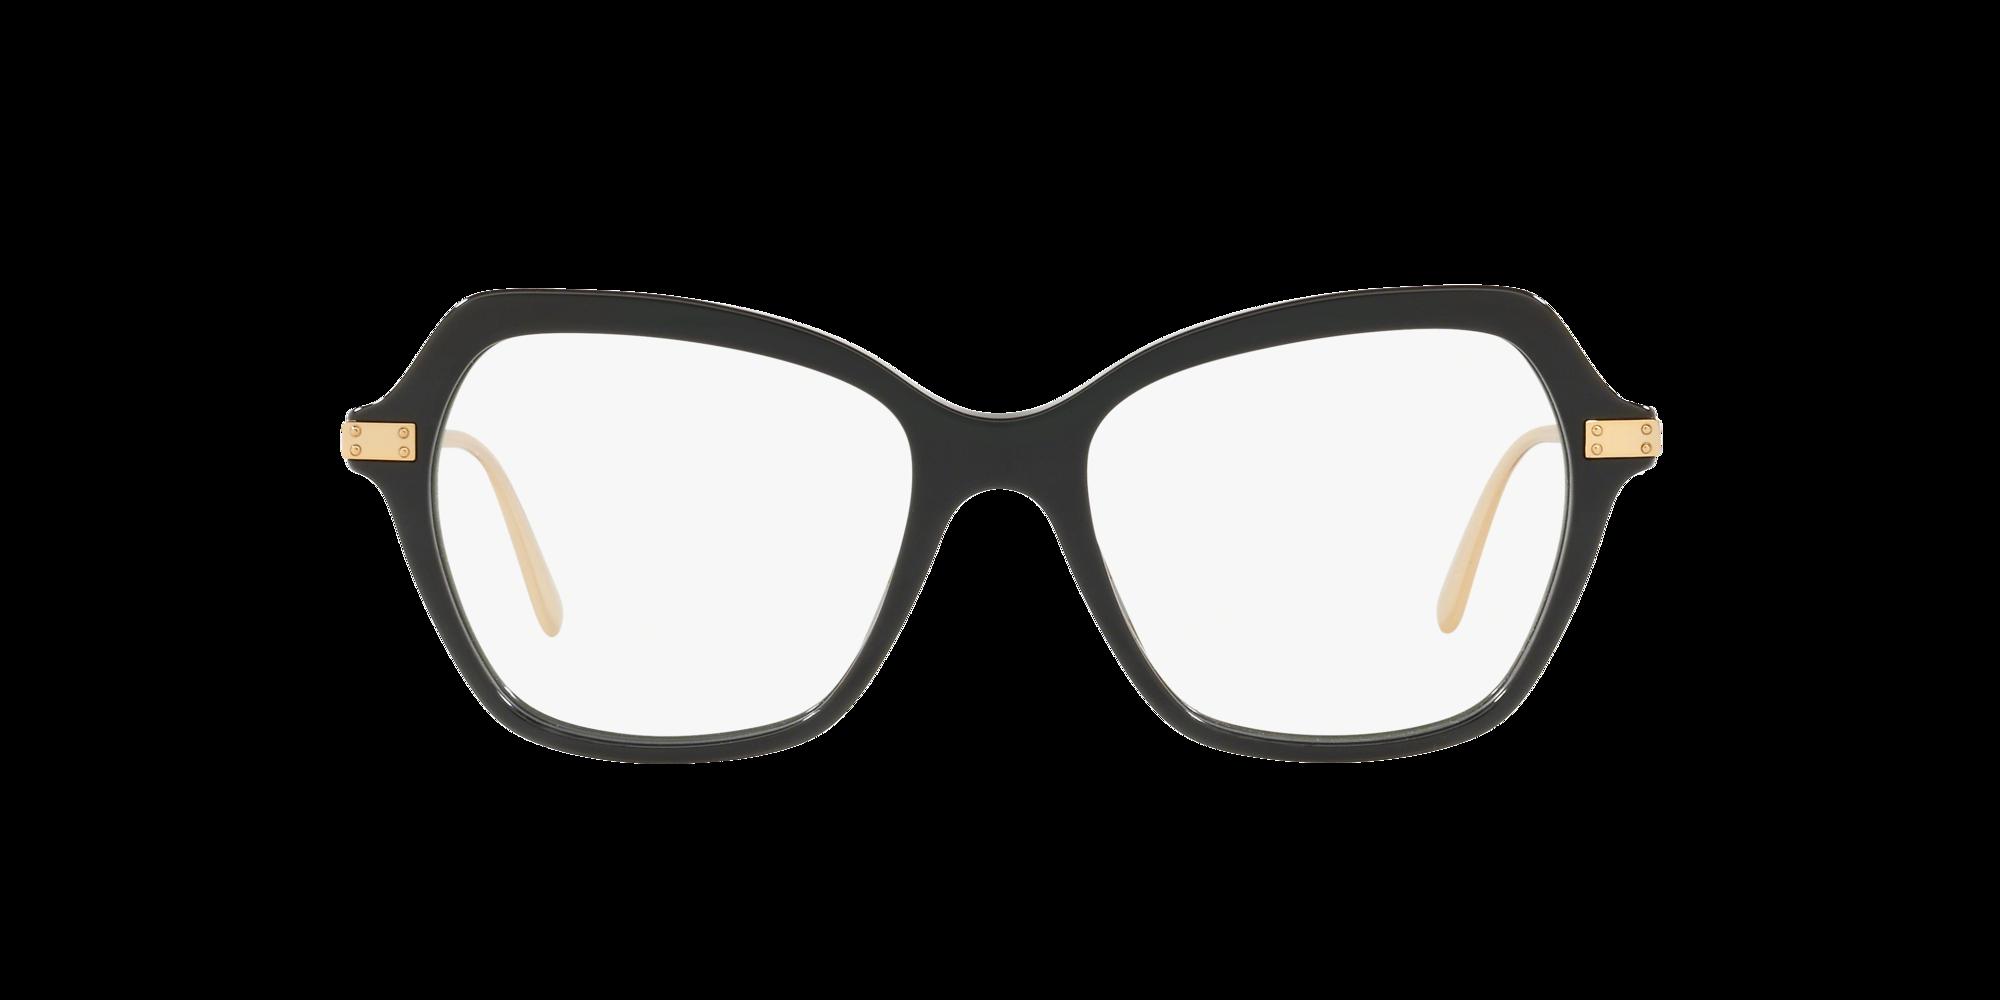 Image for DG3311 from LensCrafters | Glasses, Prescription Glasses Online, Eyewear